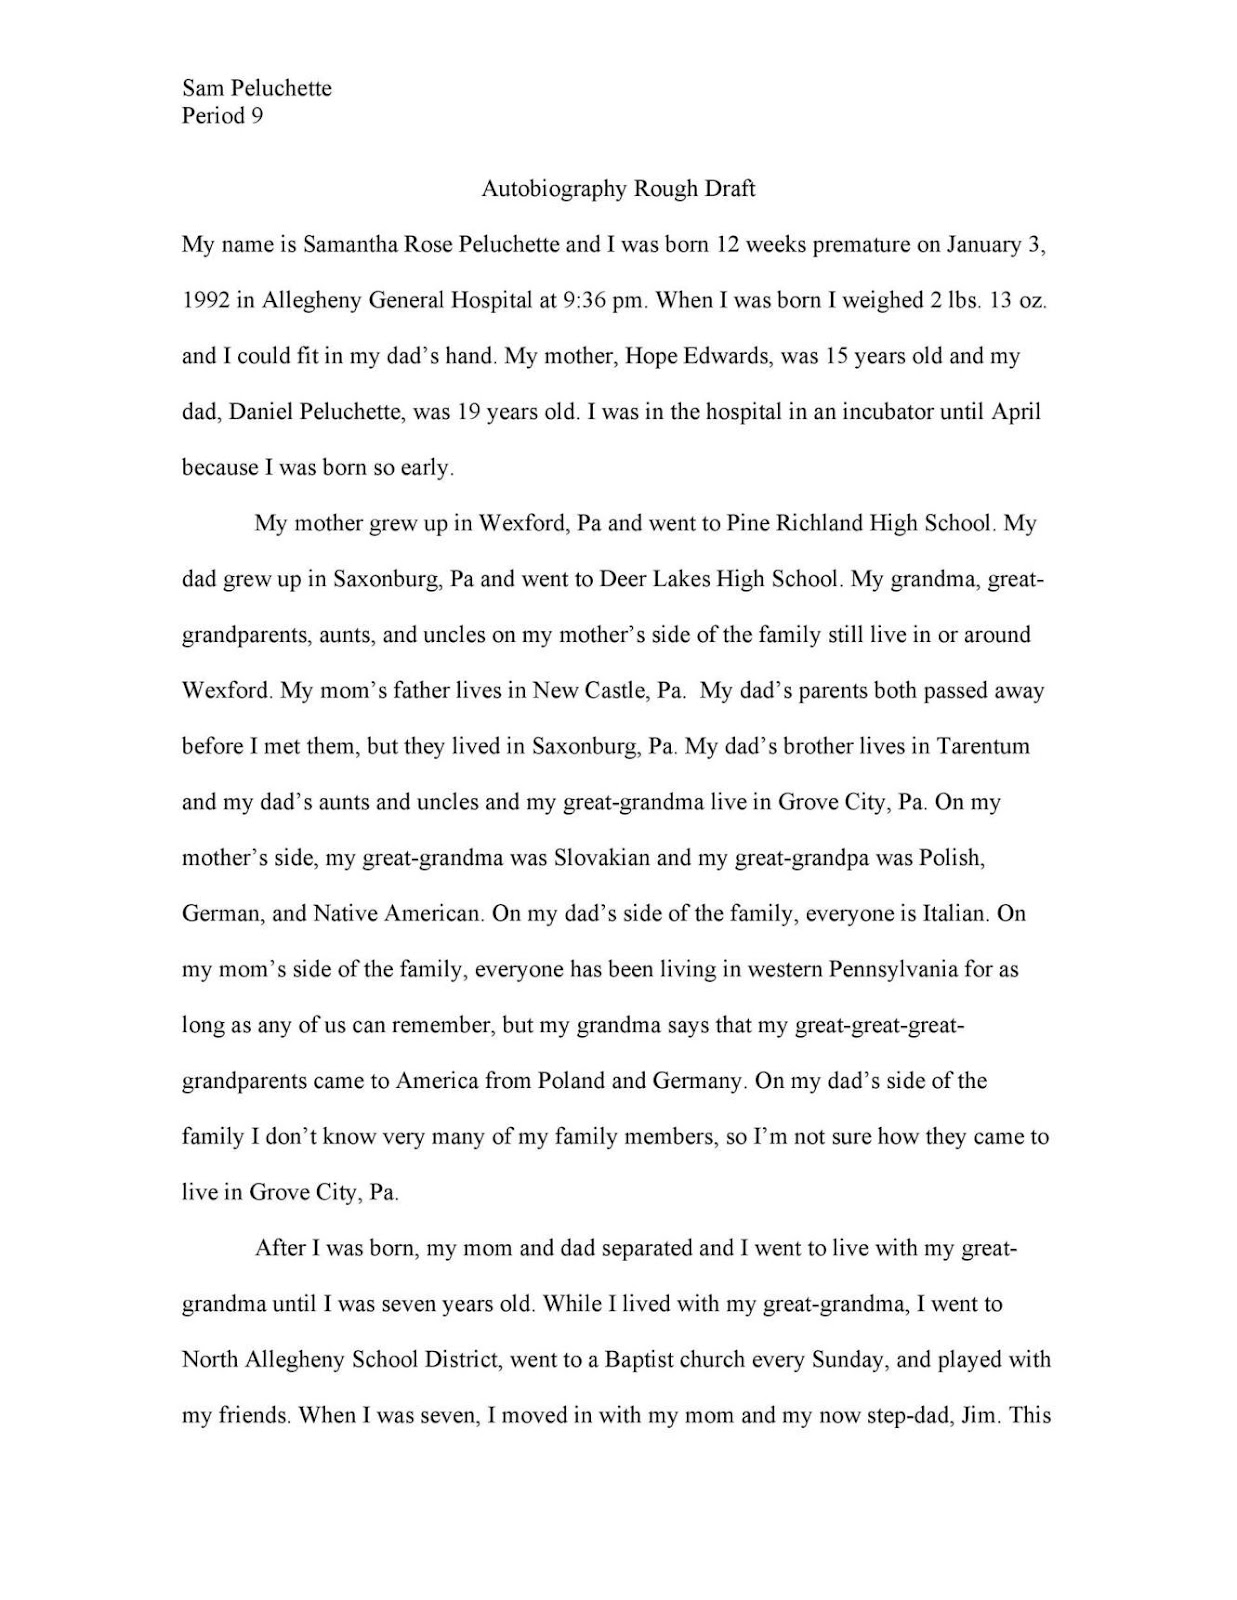 Autobiography-Template-29.jpg